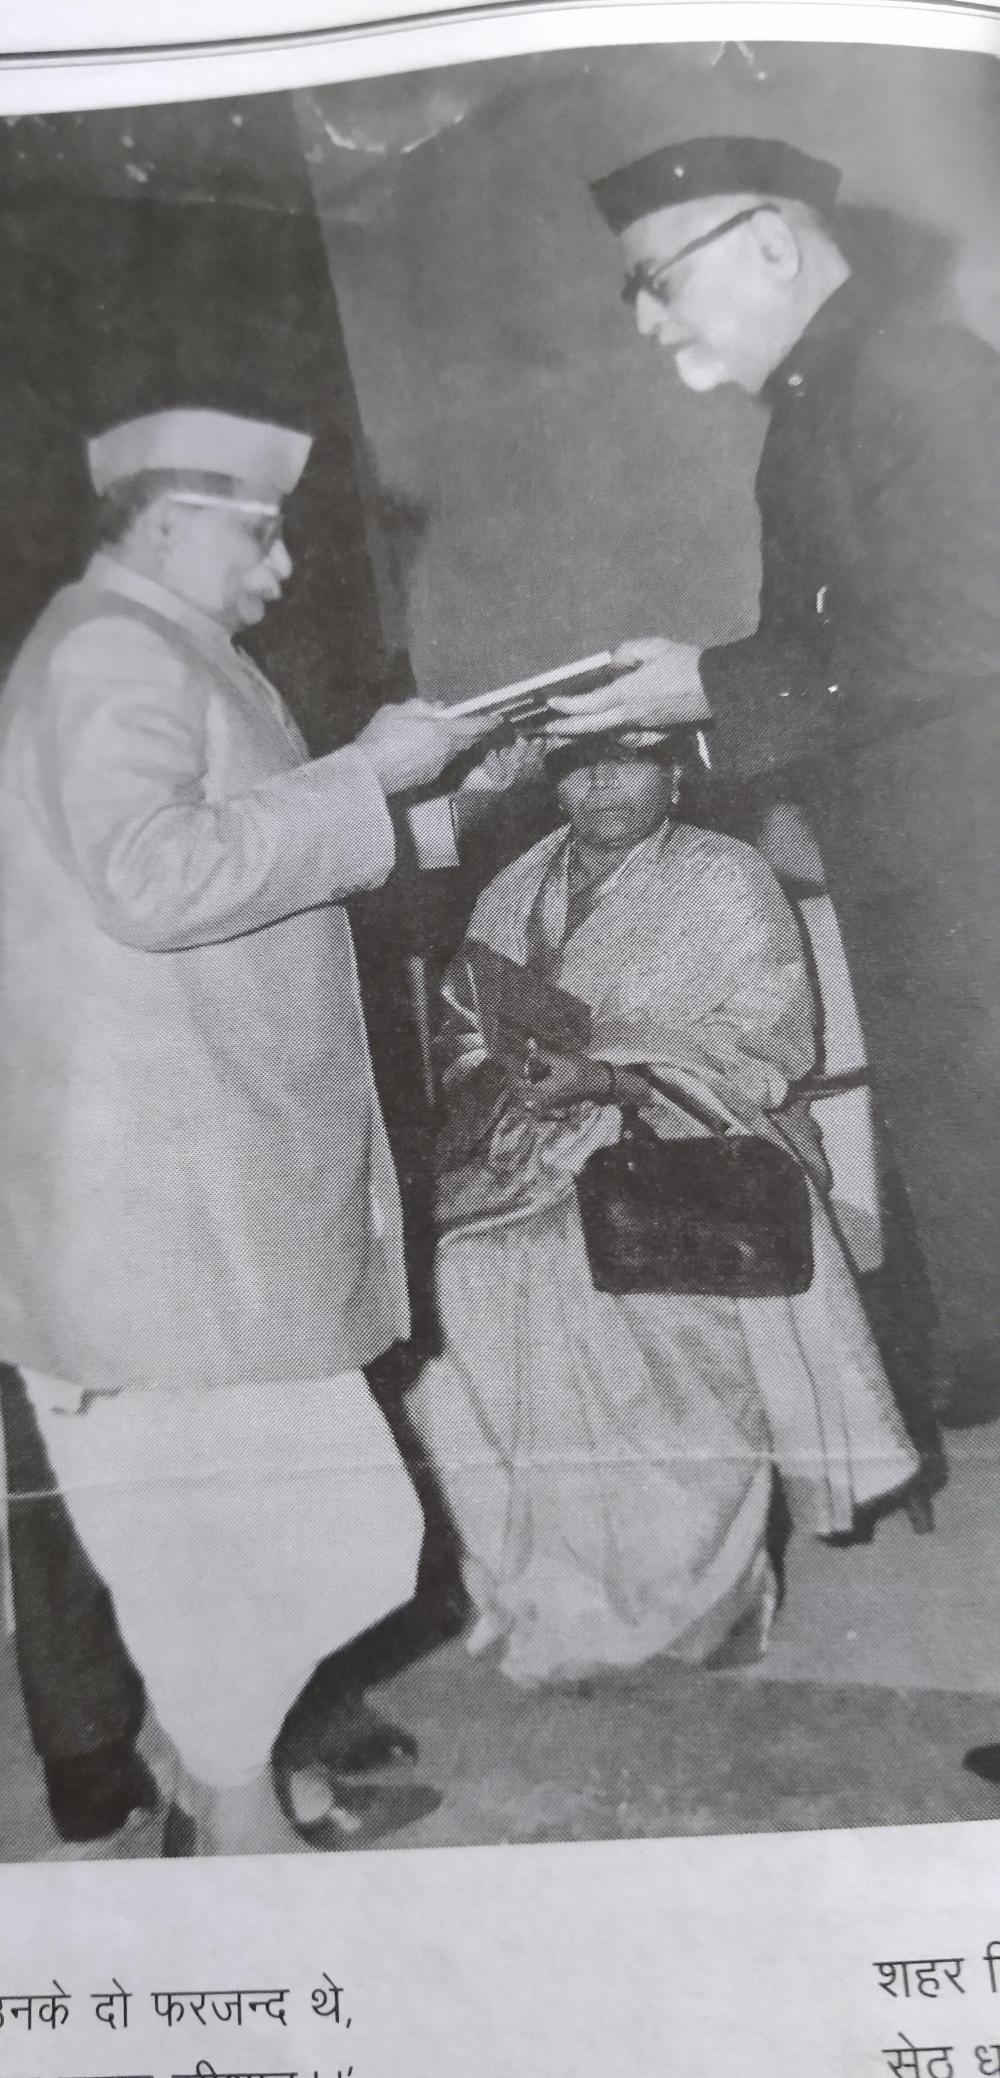 Fig.5: Shrikrishan Pehelwan receiving the Sangeet Natak Akademi award from then president of India Zakir Hussain, in 1968, for his contributions to folk theatre (Courtesy: Rajat Kumar, 'Main Akele Hee Chala Tha: Shrikrishna Pehelwan', Kalavasudha, Oct–Dec 2018, 146)